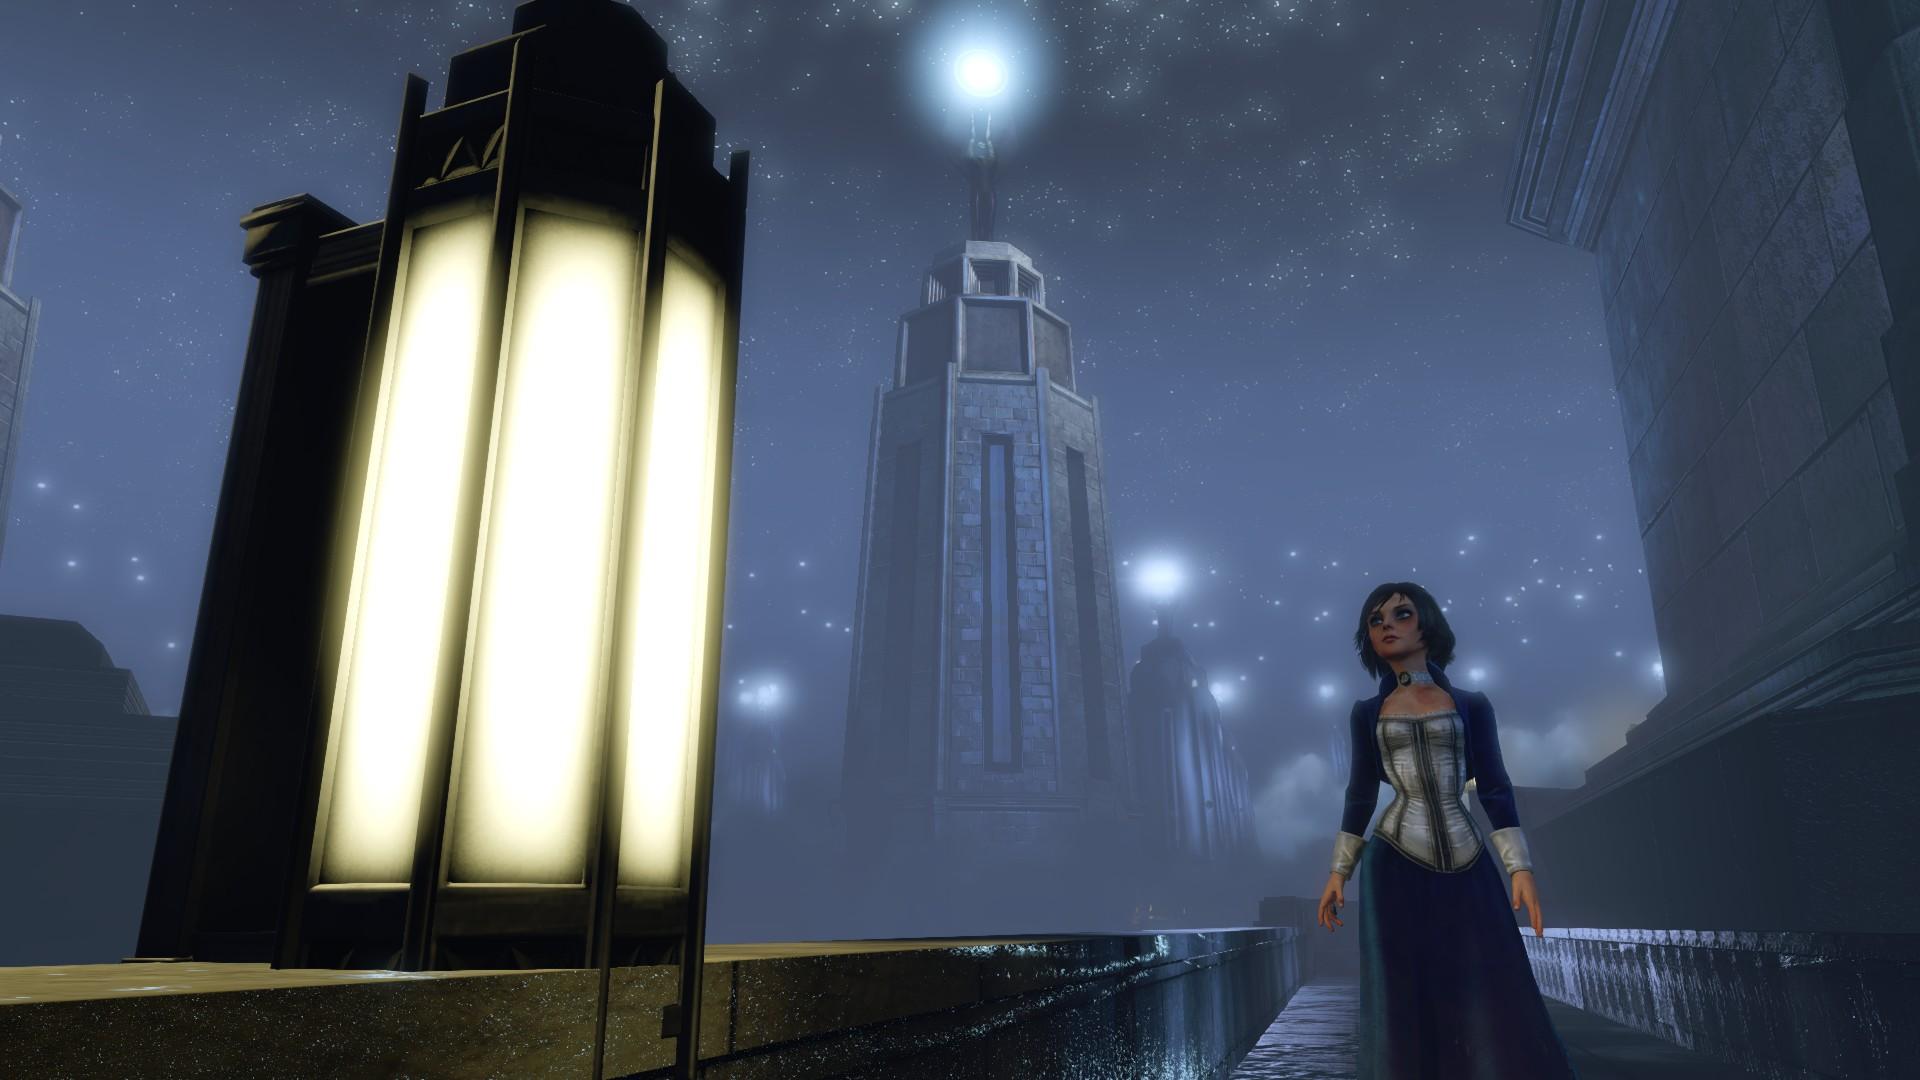 Elizabeth's Lighthouses (Bioshock Infinite spoiler by michaelajunker